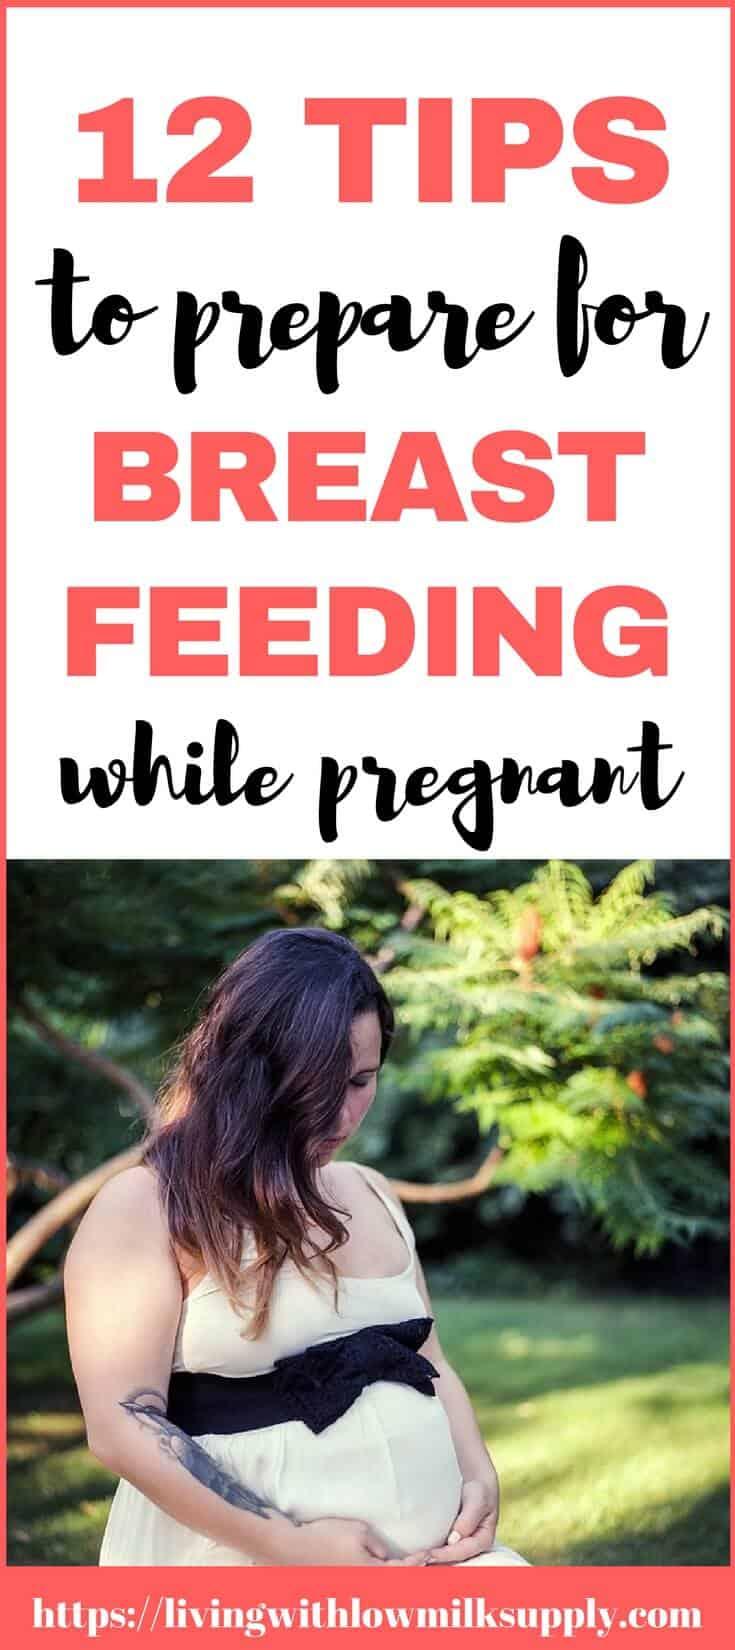 Preparing for Breastfeeding During Pregnancy | 12 ...